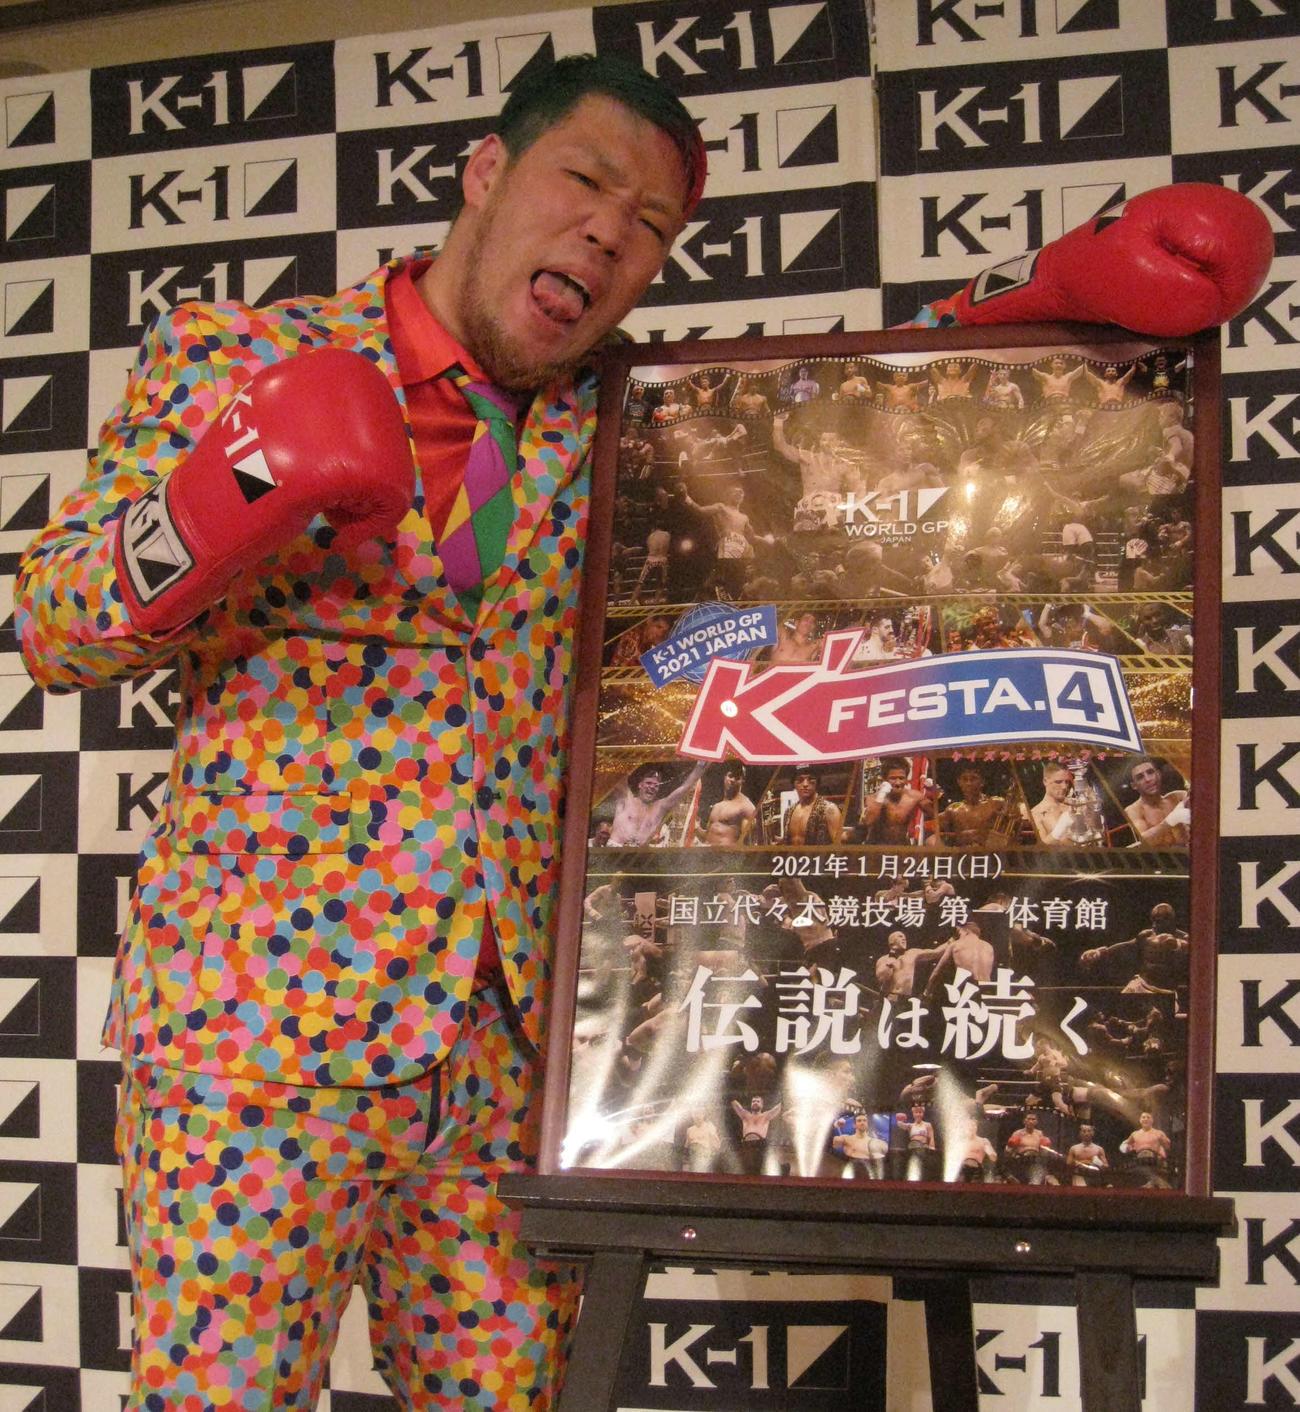 K-1のリングに復帰する京太郎(撮影・吉池彰)